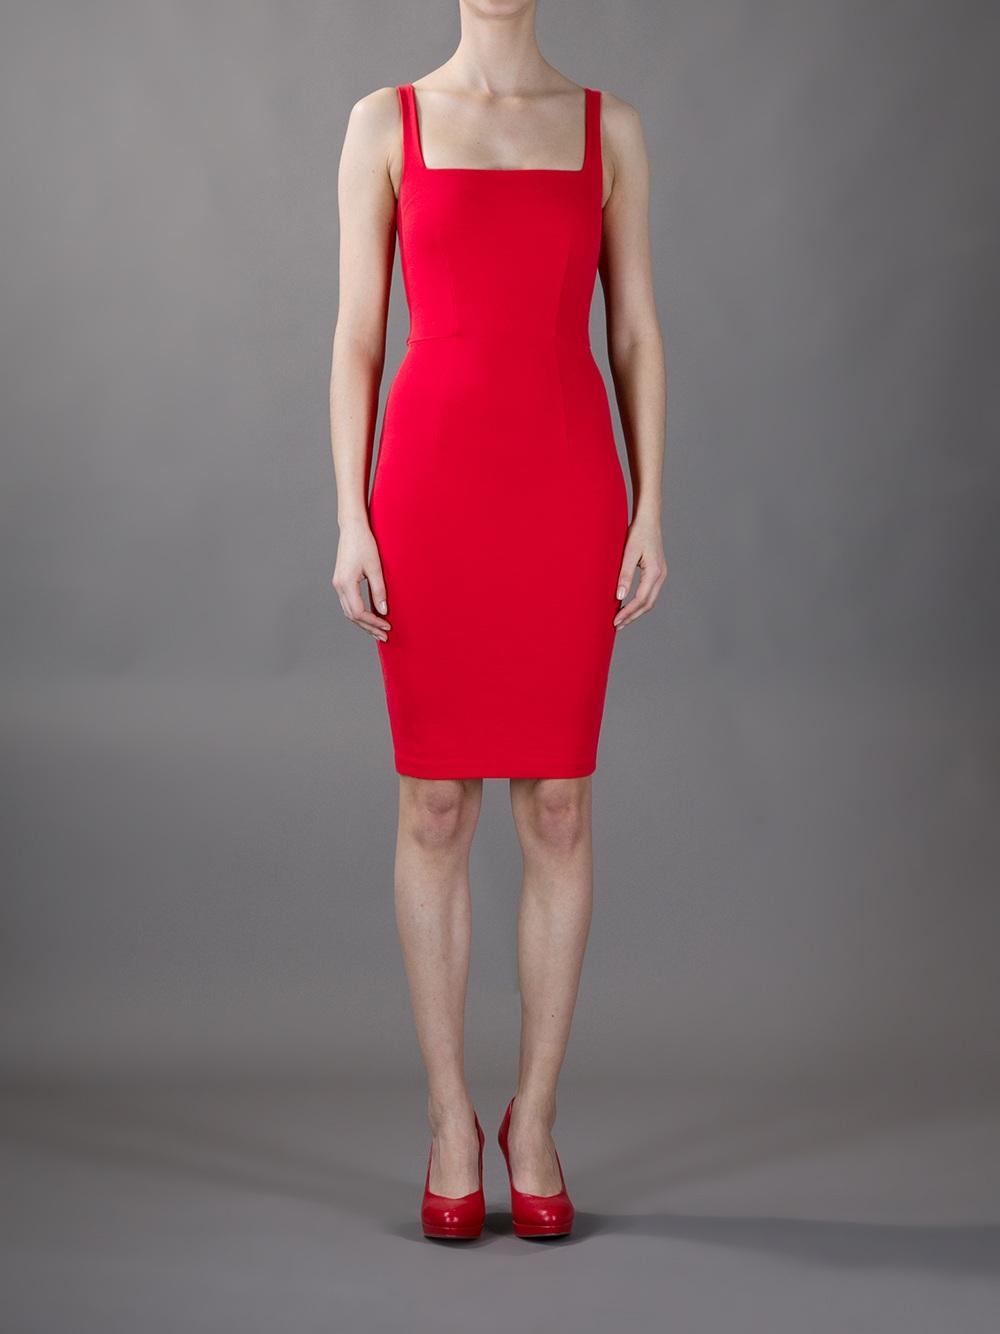 6cd1056cf8 Stella McCartney Sleeveless Bodycon Dress in Red - Lyst